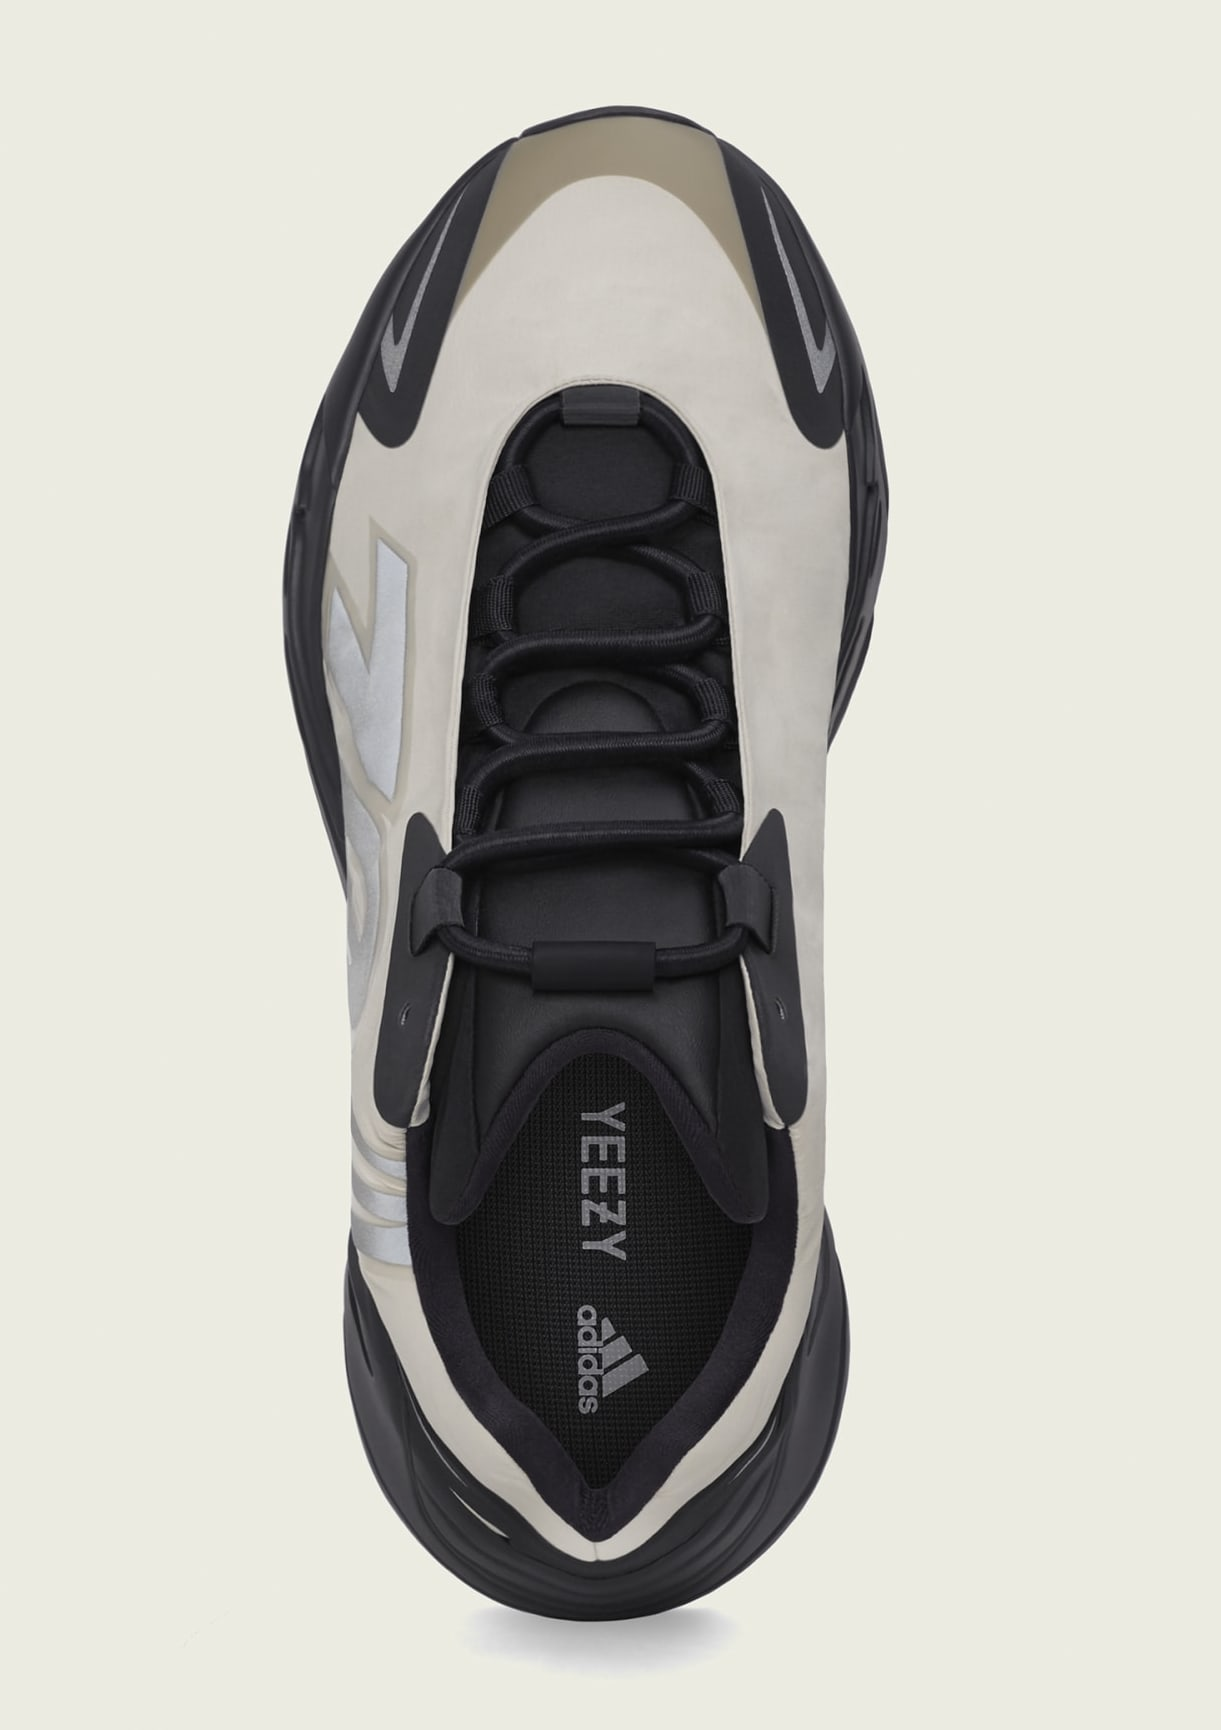 Adidas Yeezy Boost 700 MNVN 'Bone' FY3729 Top